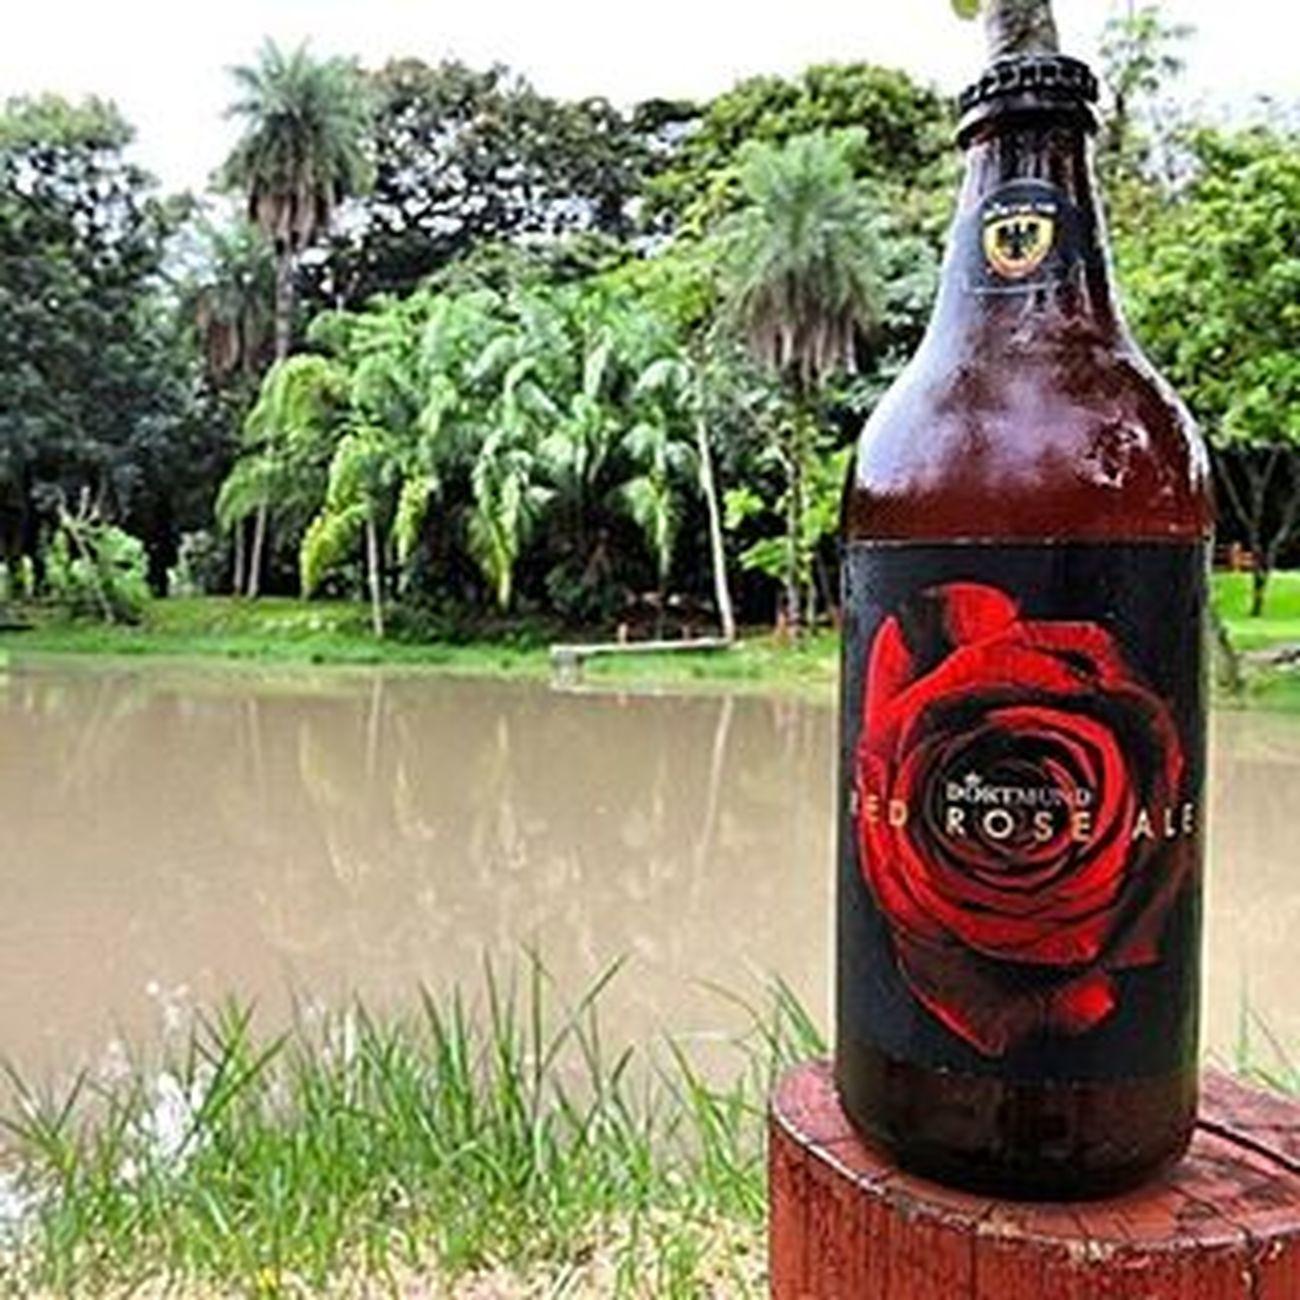 🍺 Dortmund Red Rose Ale 🍺 ARedRoseAleé uma cerveja de Alta fermentação, coloração avermelhada, corpo médio, bastante maltada com destaque especial para oblendde maltes. Possui aroma deToffeee caramelo com baixo amargor e notas florais. Destaque para esse rótulo show. País: Brasil Graduação alcoólica: 6,0% Cervejadortmund Ale 9ninebeers Cheers Cerveja Beer Beers Beergarden  Beeradvocate Beerlove Craftbeer Pivo Beerpics Beerlife Beergasm Beersnob Cerveza Craftbrew Birra Instabeer Instacerveja Beerstagram Craftbeerlife Cervejaartesanal Beergeek beertimebeertographybeerpornbeernerdbeeroftheday